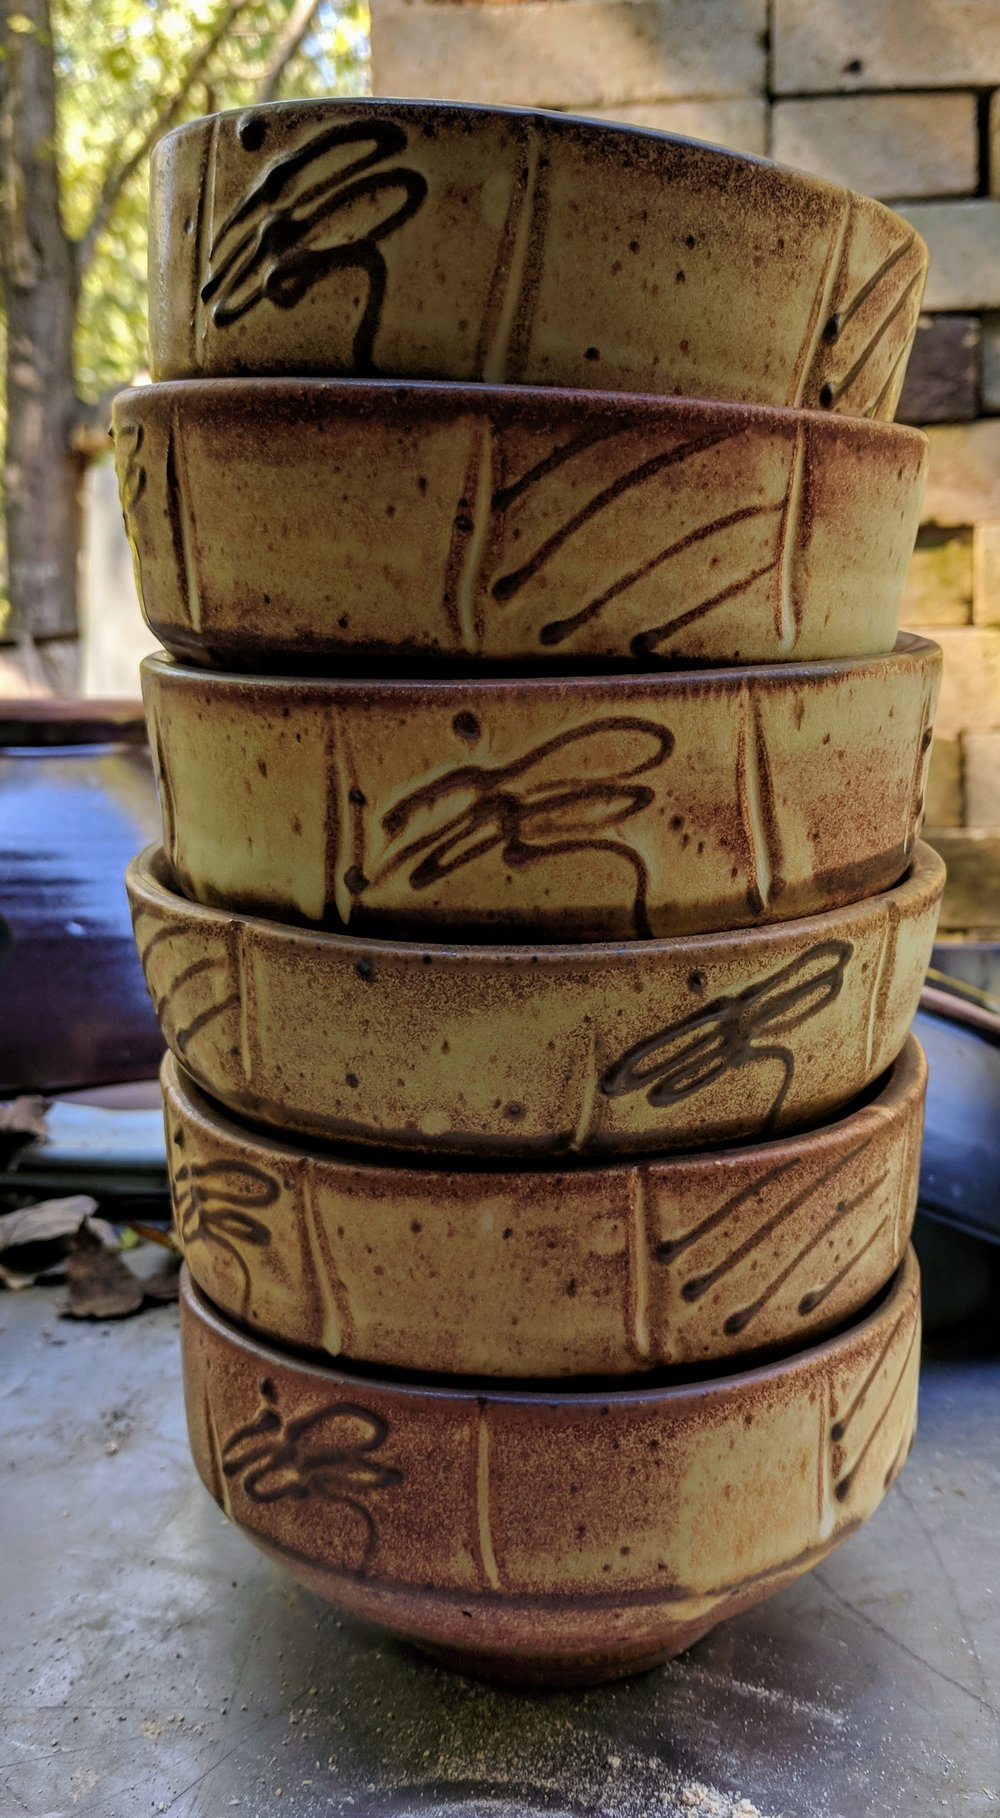 mamo-dragonfly-bowls.jpg